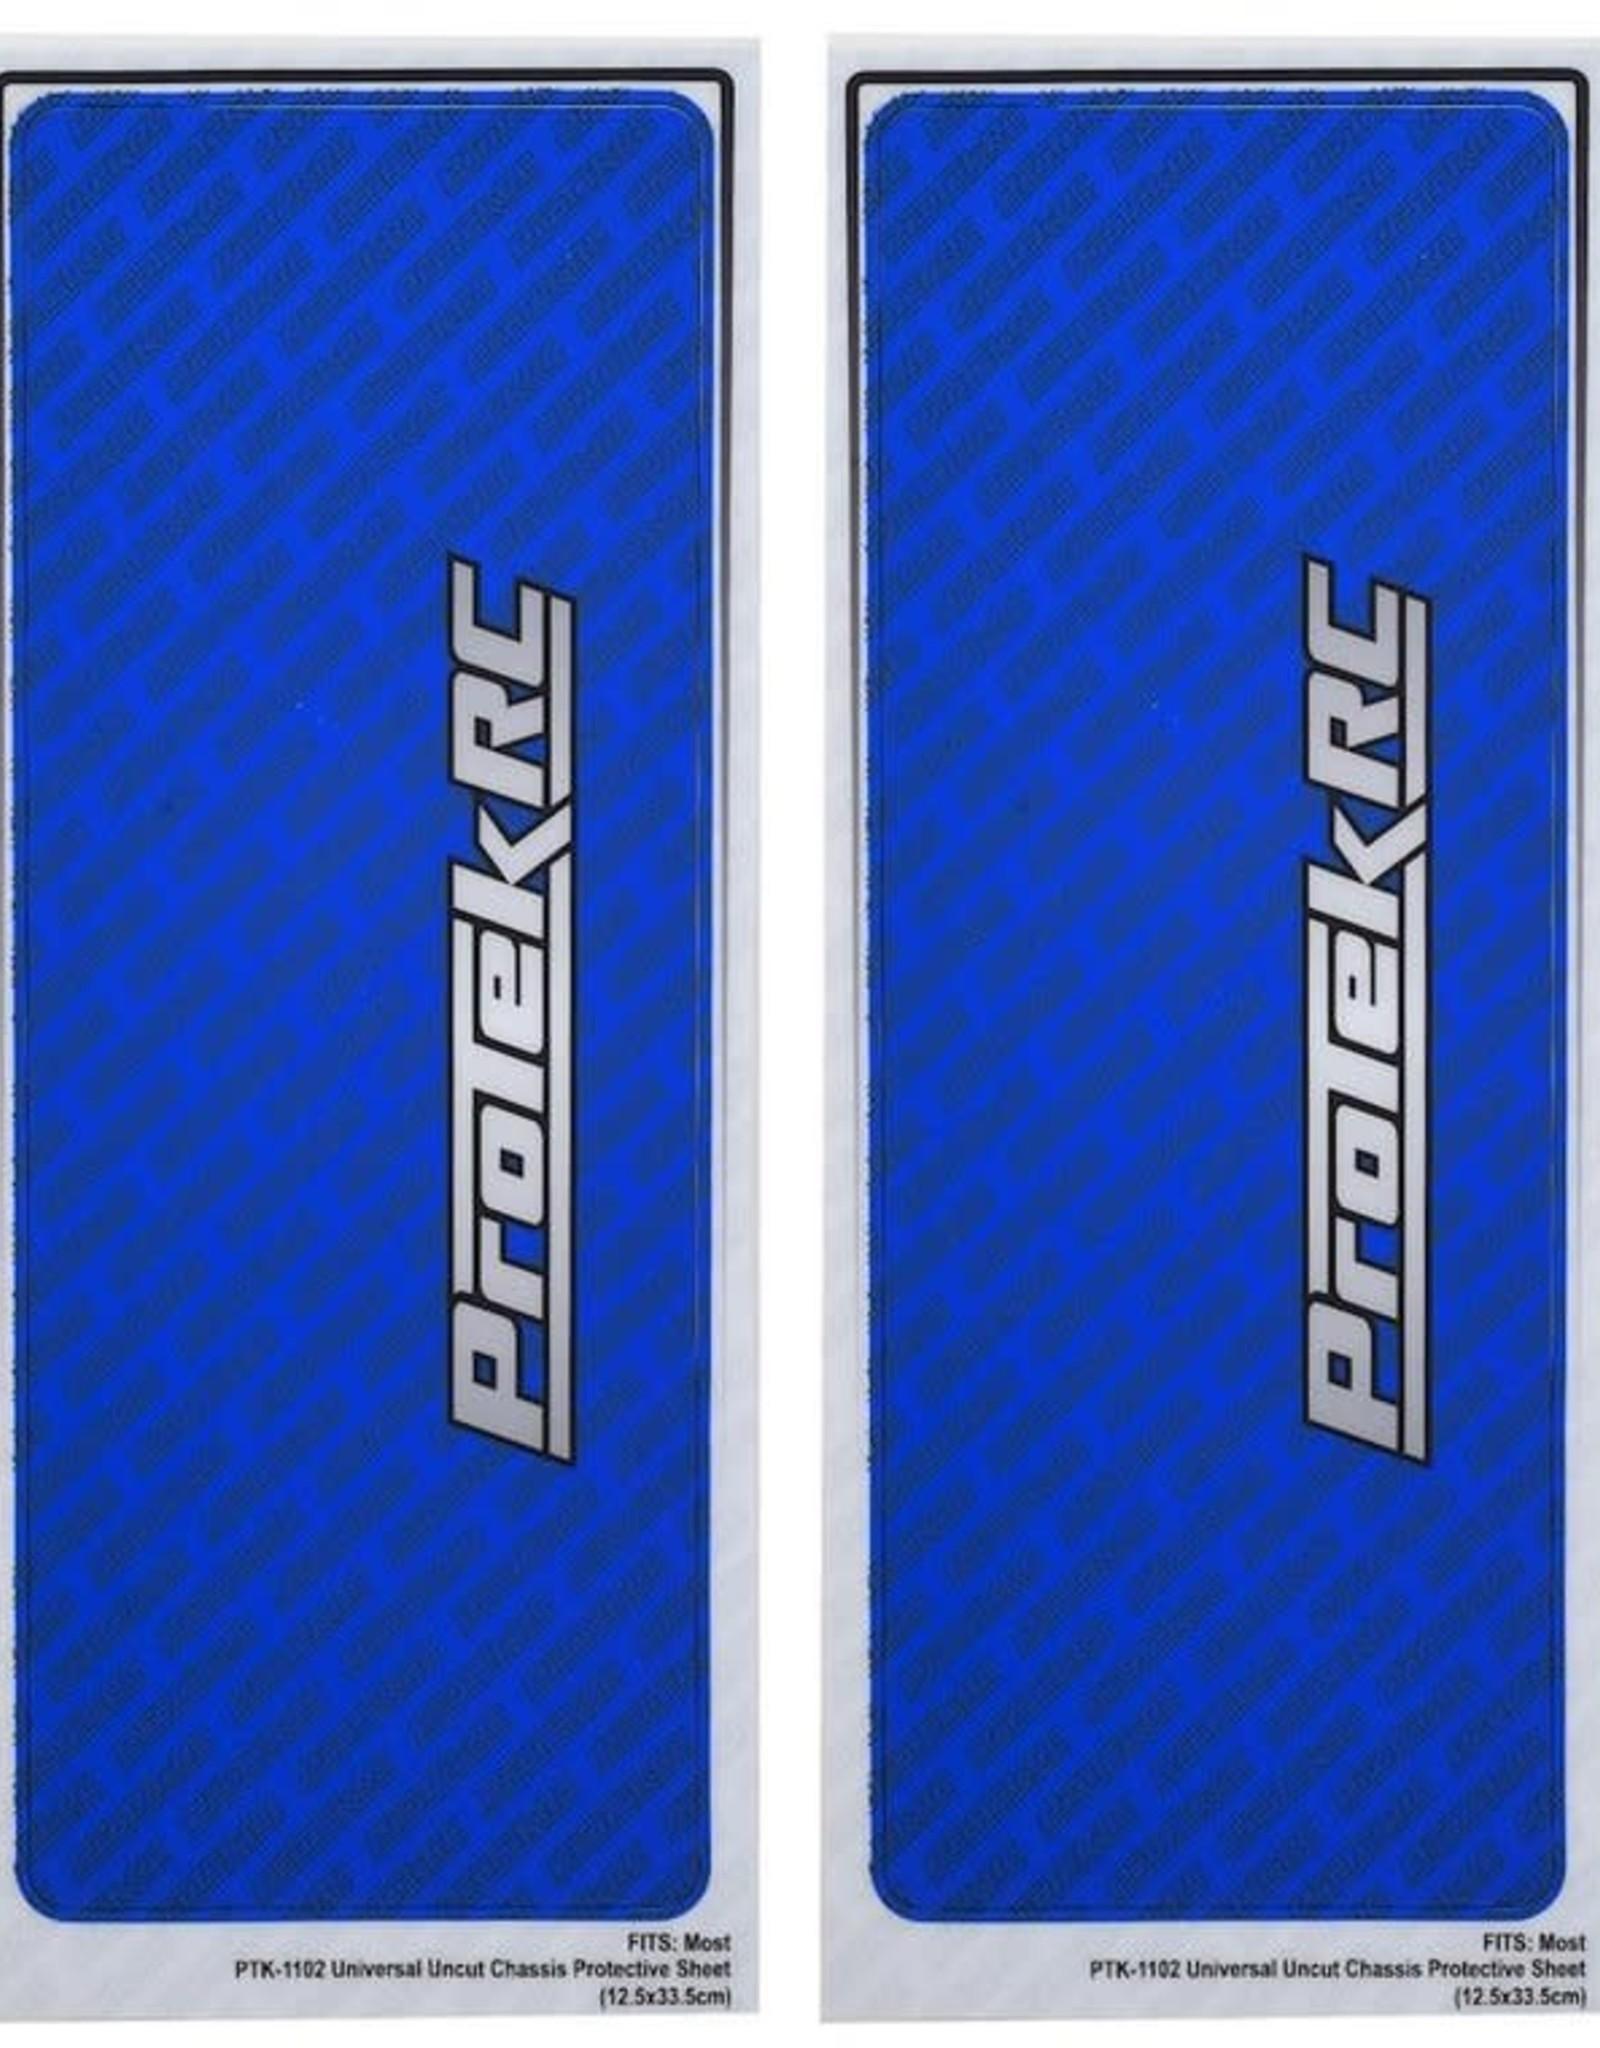 Protek RC ProTek RC Universal Chassis Protective Sheet (Blue) (2) (12.5x33.5cm)